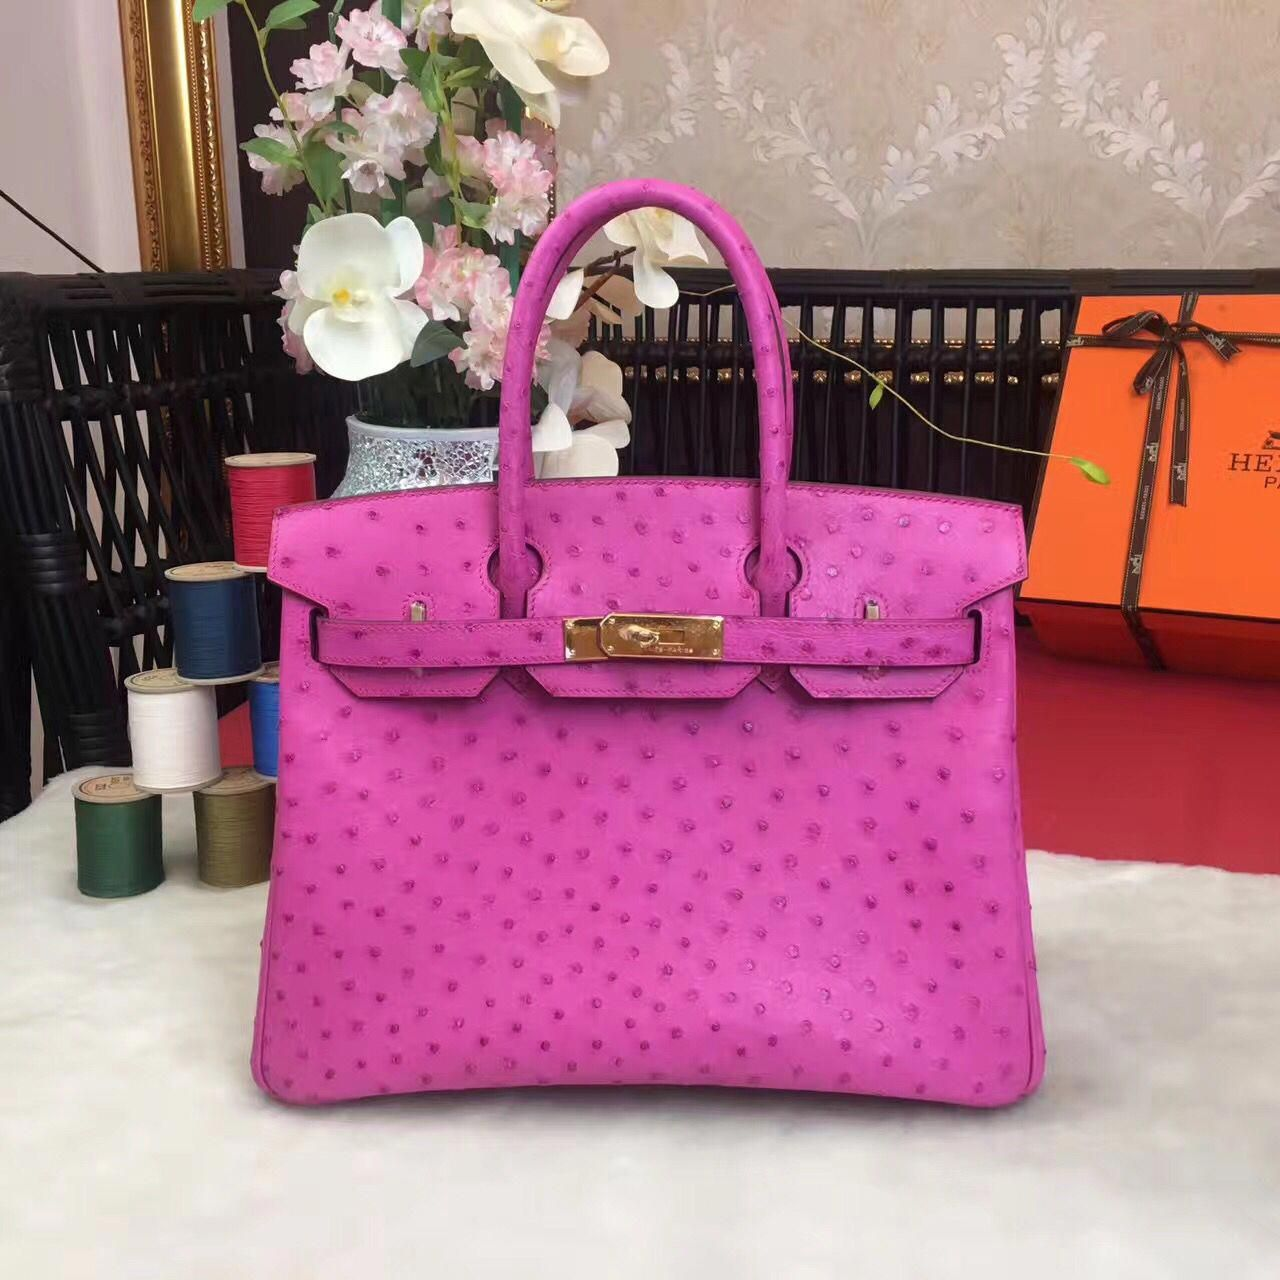 Birkin Bags For Sale Uk